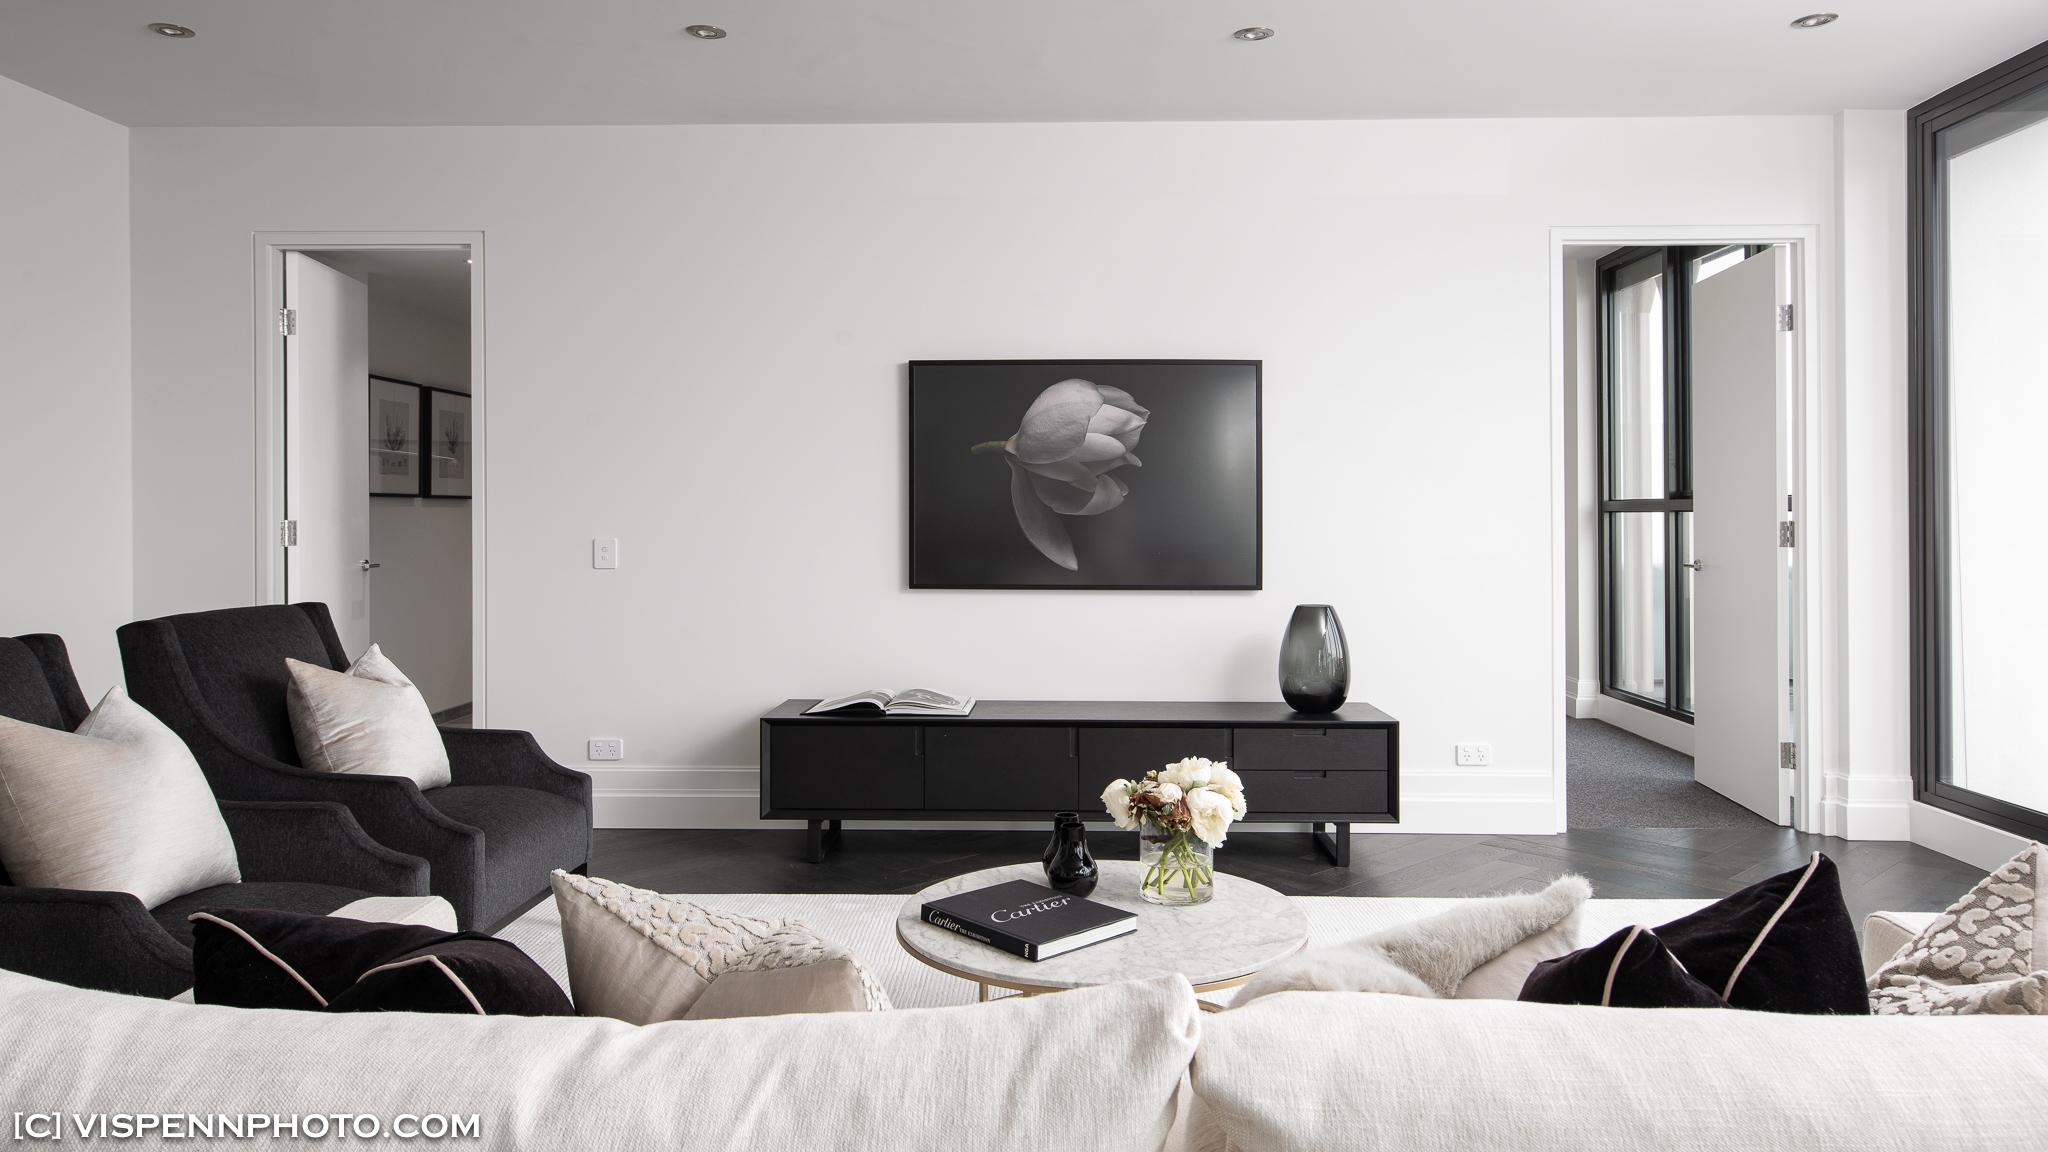 REAL ESTATE INTERIOR Photography Melbourne VISPENN 墨尔本 地产摄影 公寓拍摄 豪宅拍摄 VR远程看房 房产航拍 HAR00425 Edit